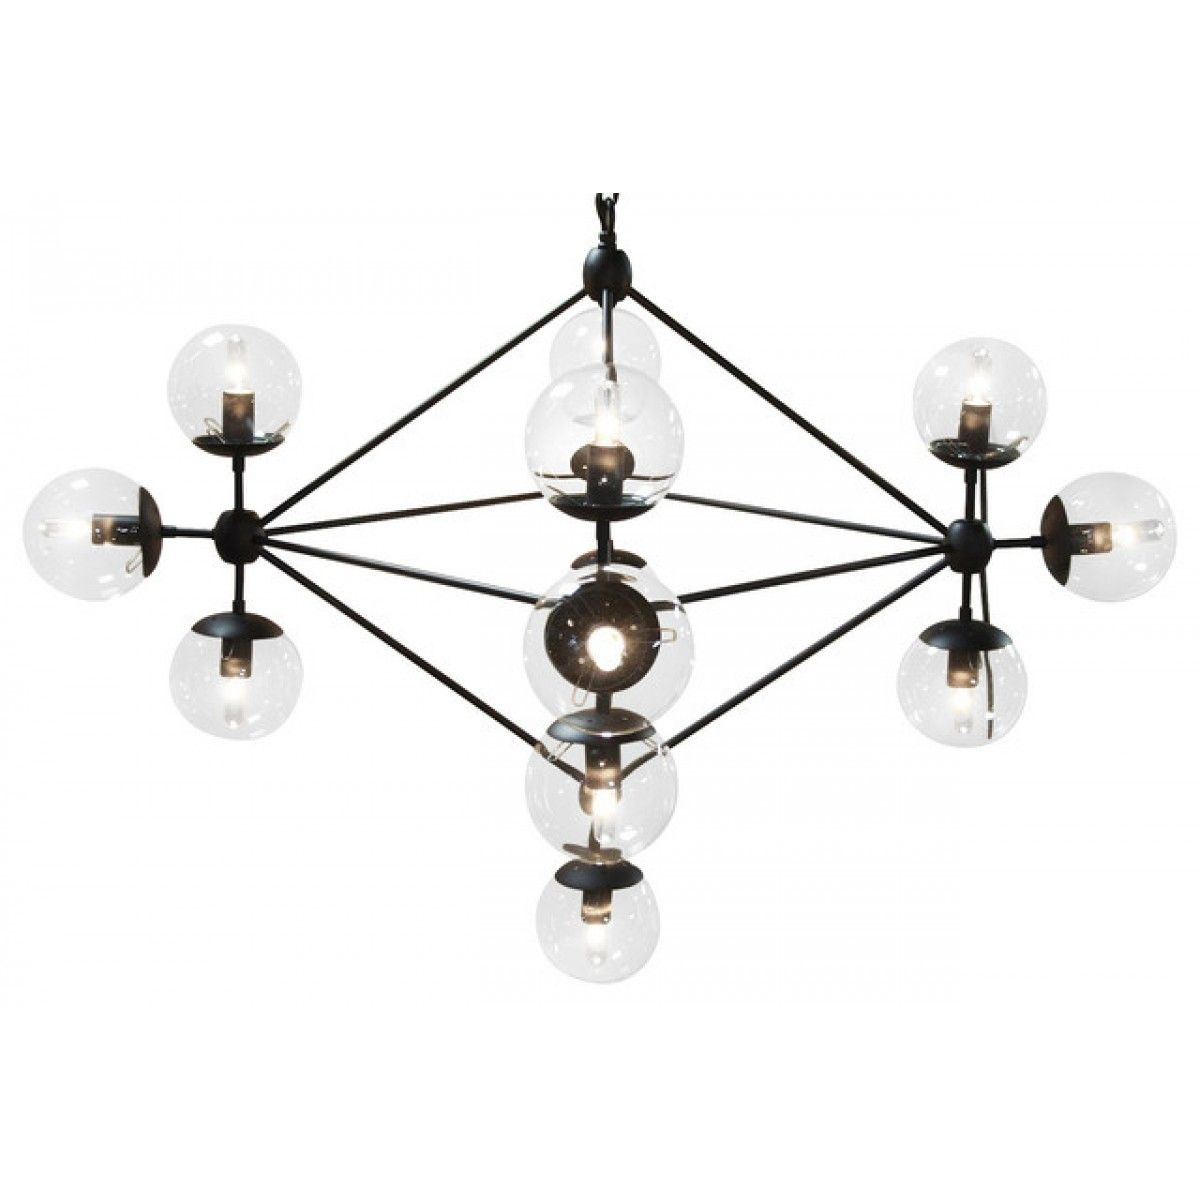 Pluto chandelier small salle dexposition montral luminaire montral luminaire quincaillerie mozeypictures Gallery